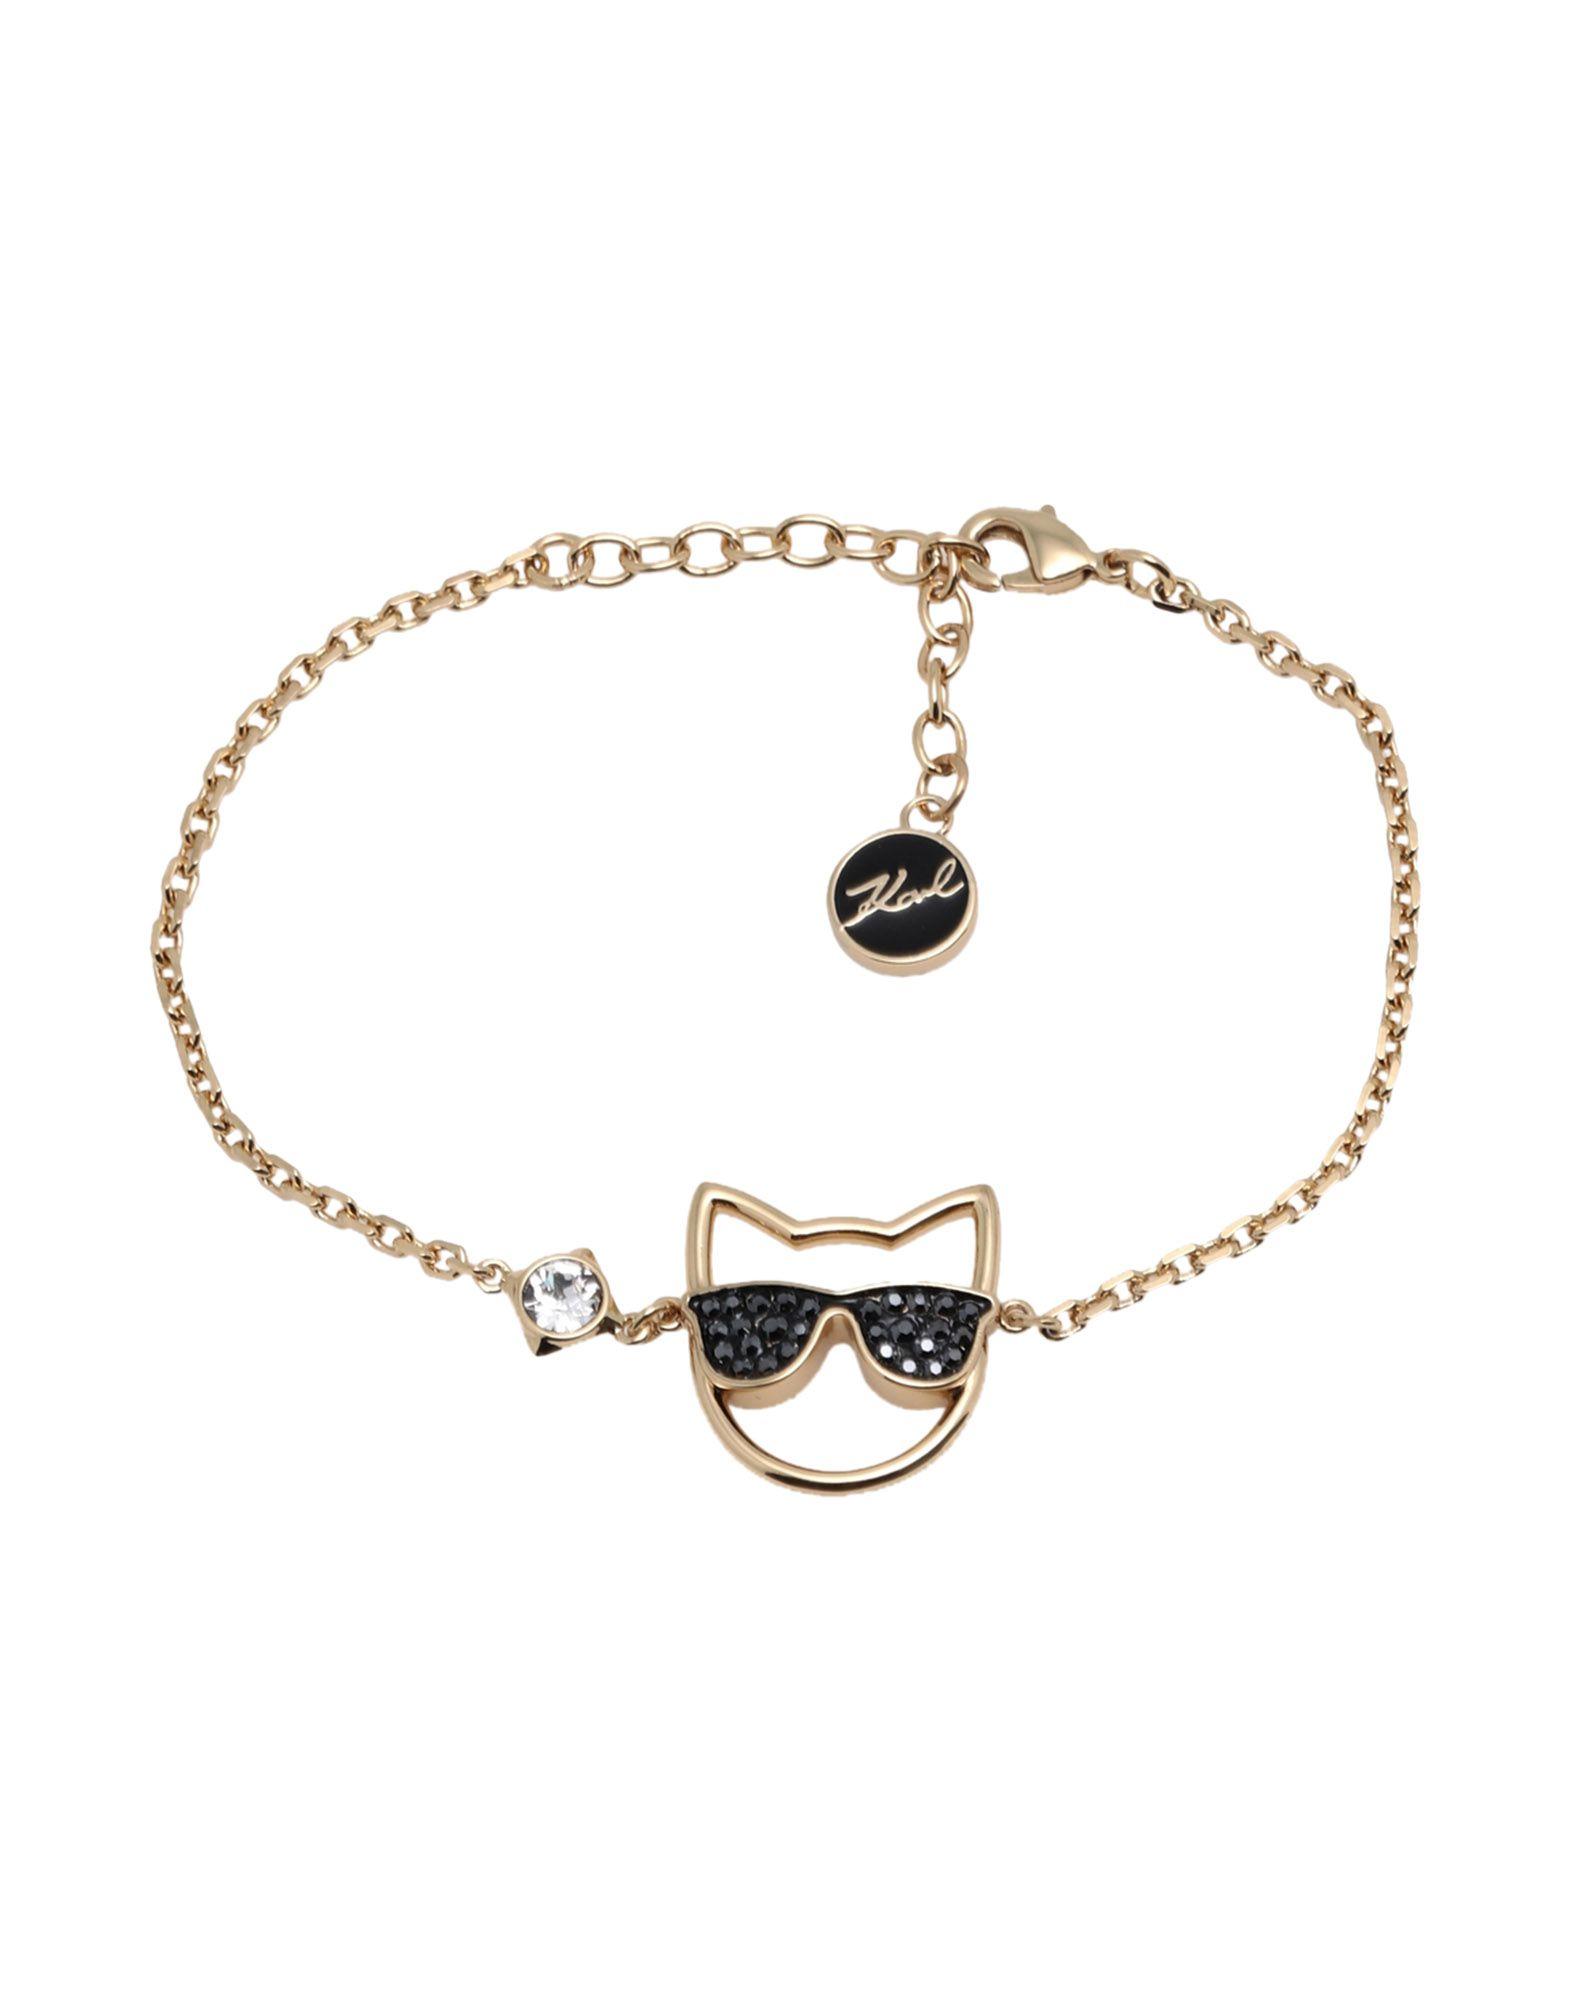 KARL LAGERFELD Bracelets - Item 50243646